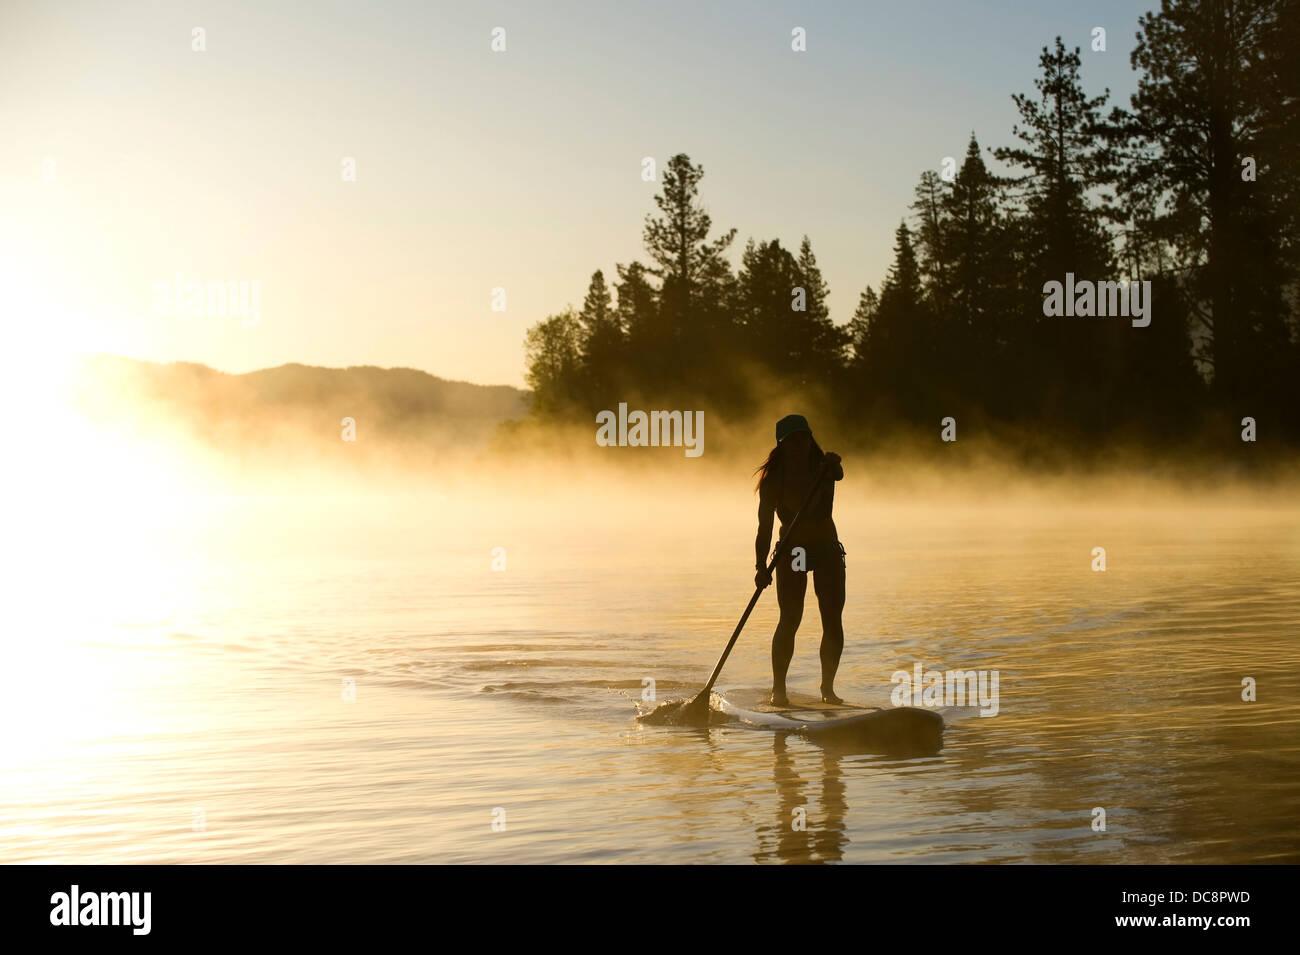 Eine Frau ist Silhouette Stand Up Paddling (SUP) bei Sonnenaufgang im Nebel in Lake Tahoe, Kalifornien. Stockbild